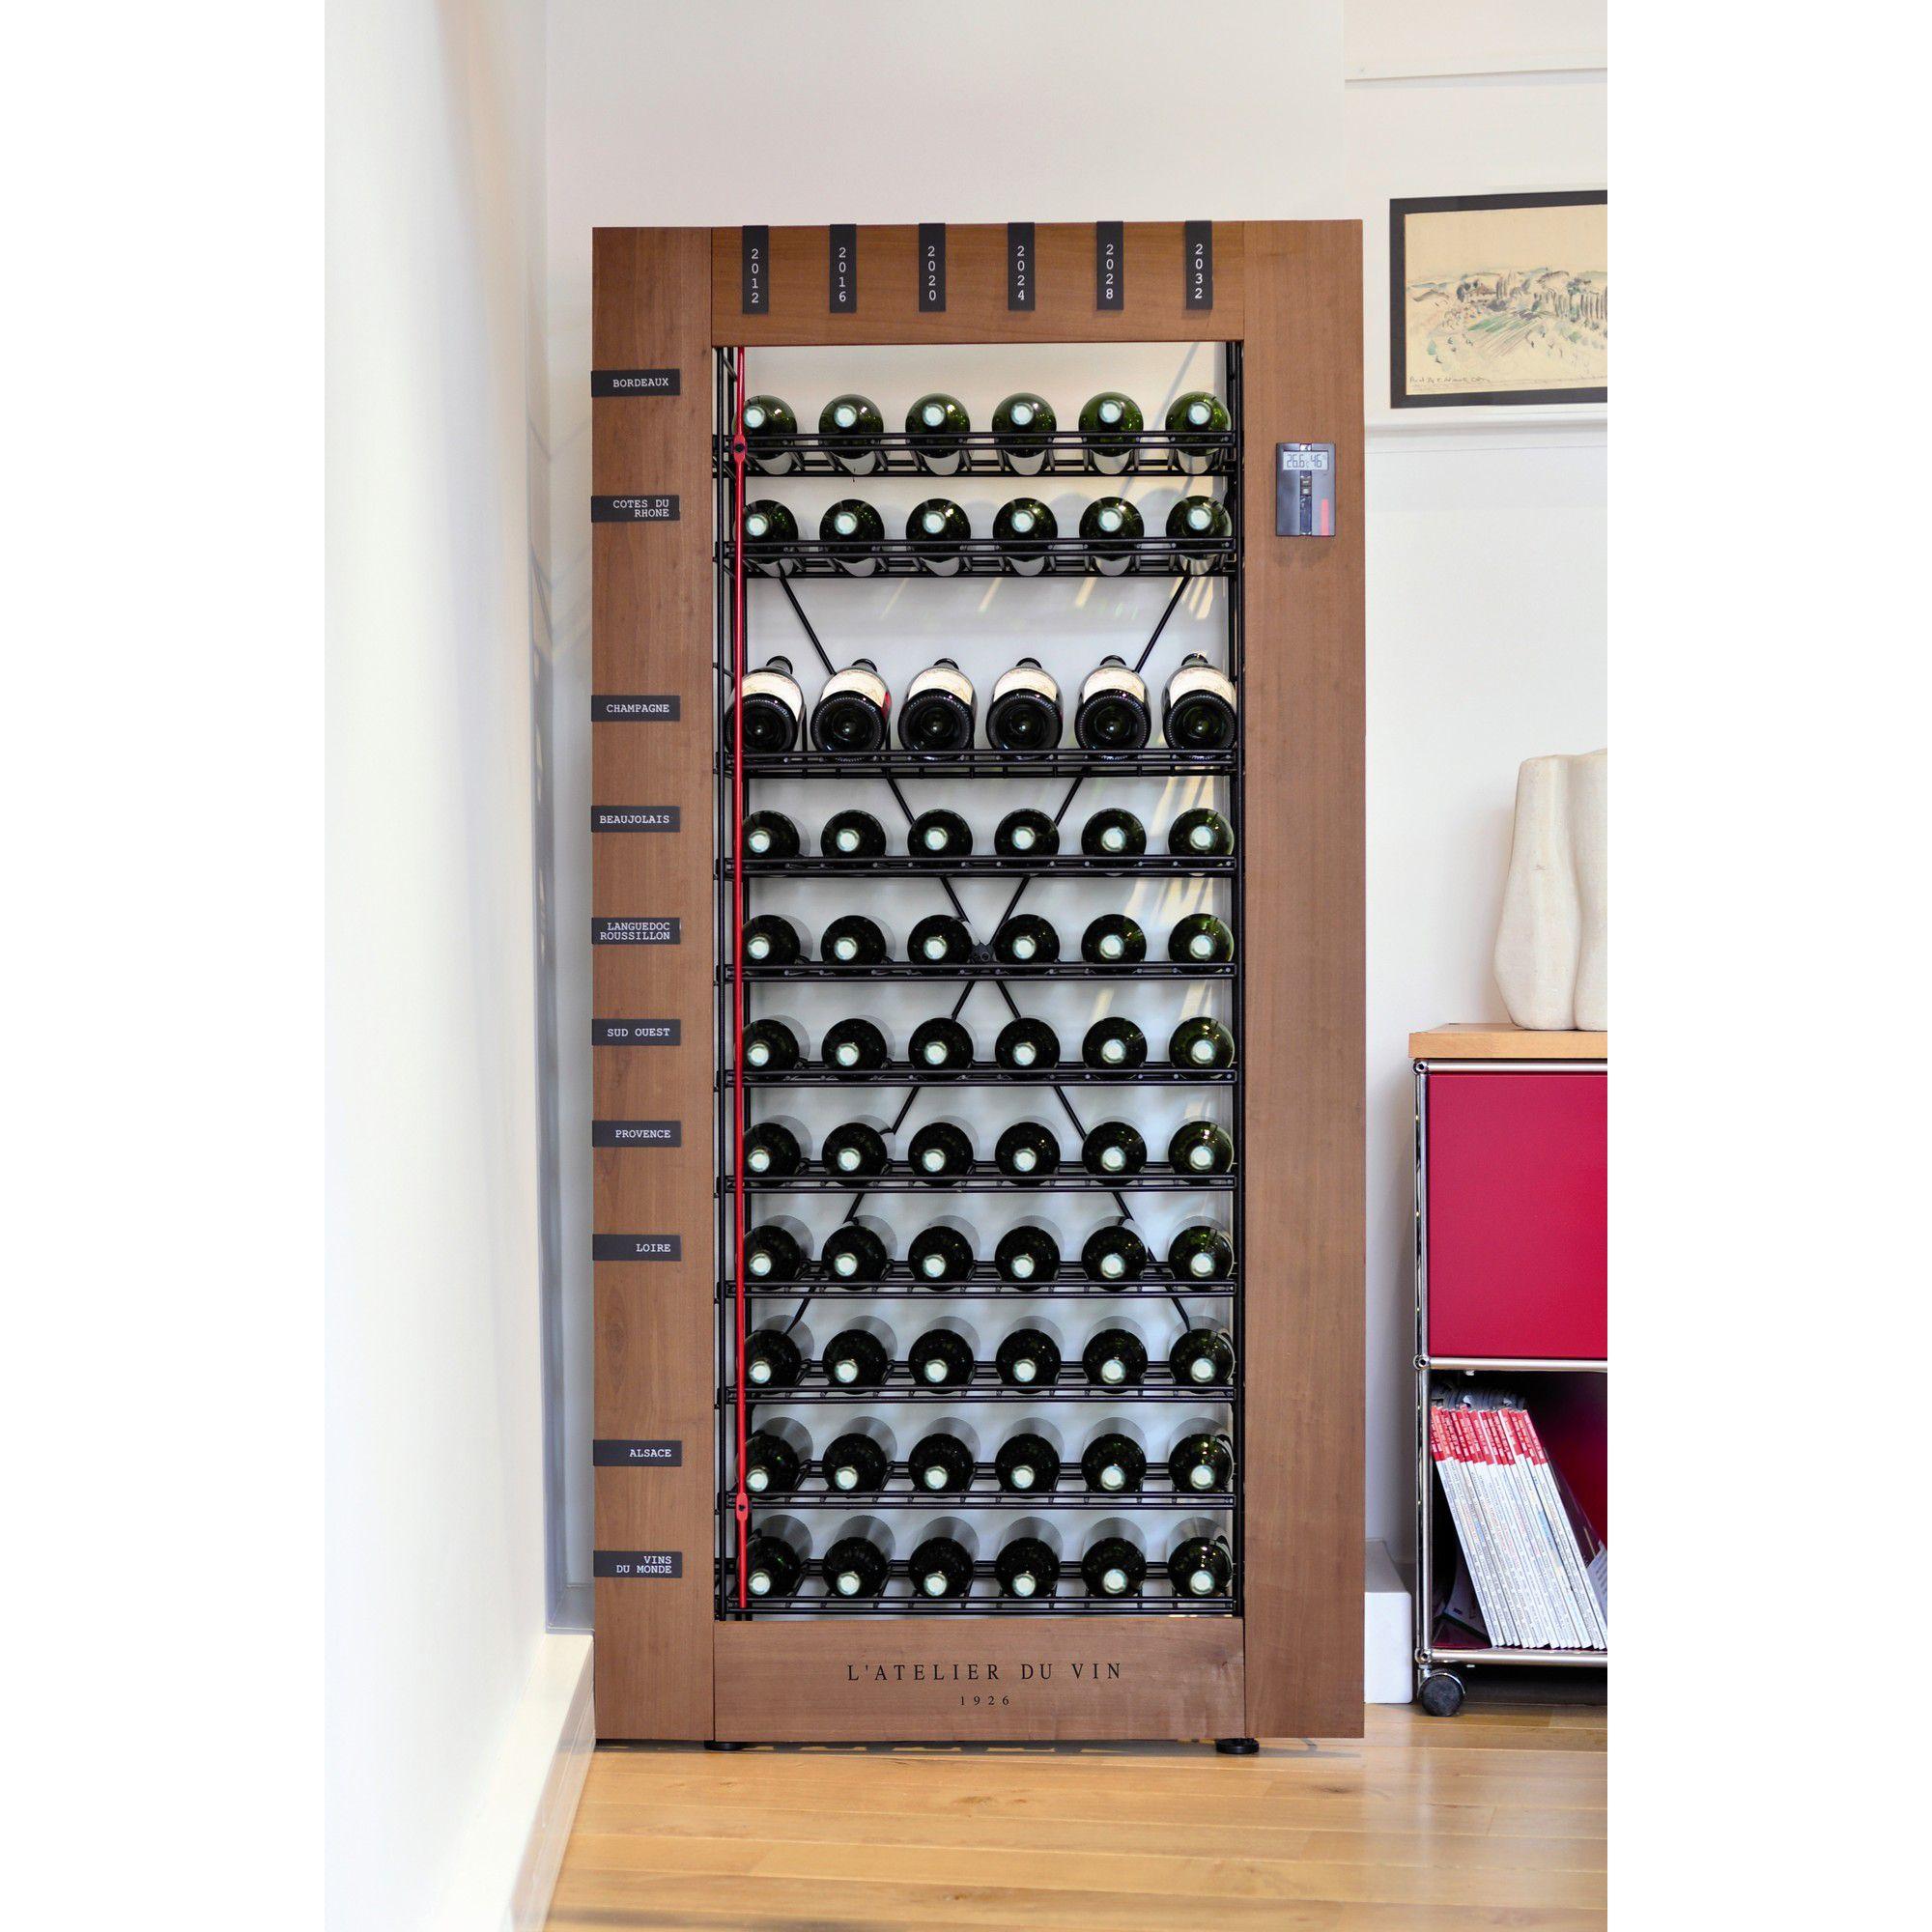 L'Atelier du Vin Storing Les Caves Smart Cellars Basic Unit (66 Bottles) at Tesco Direct